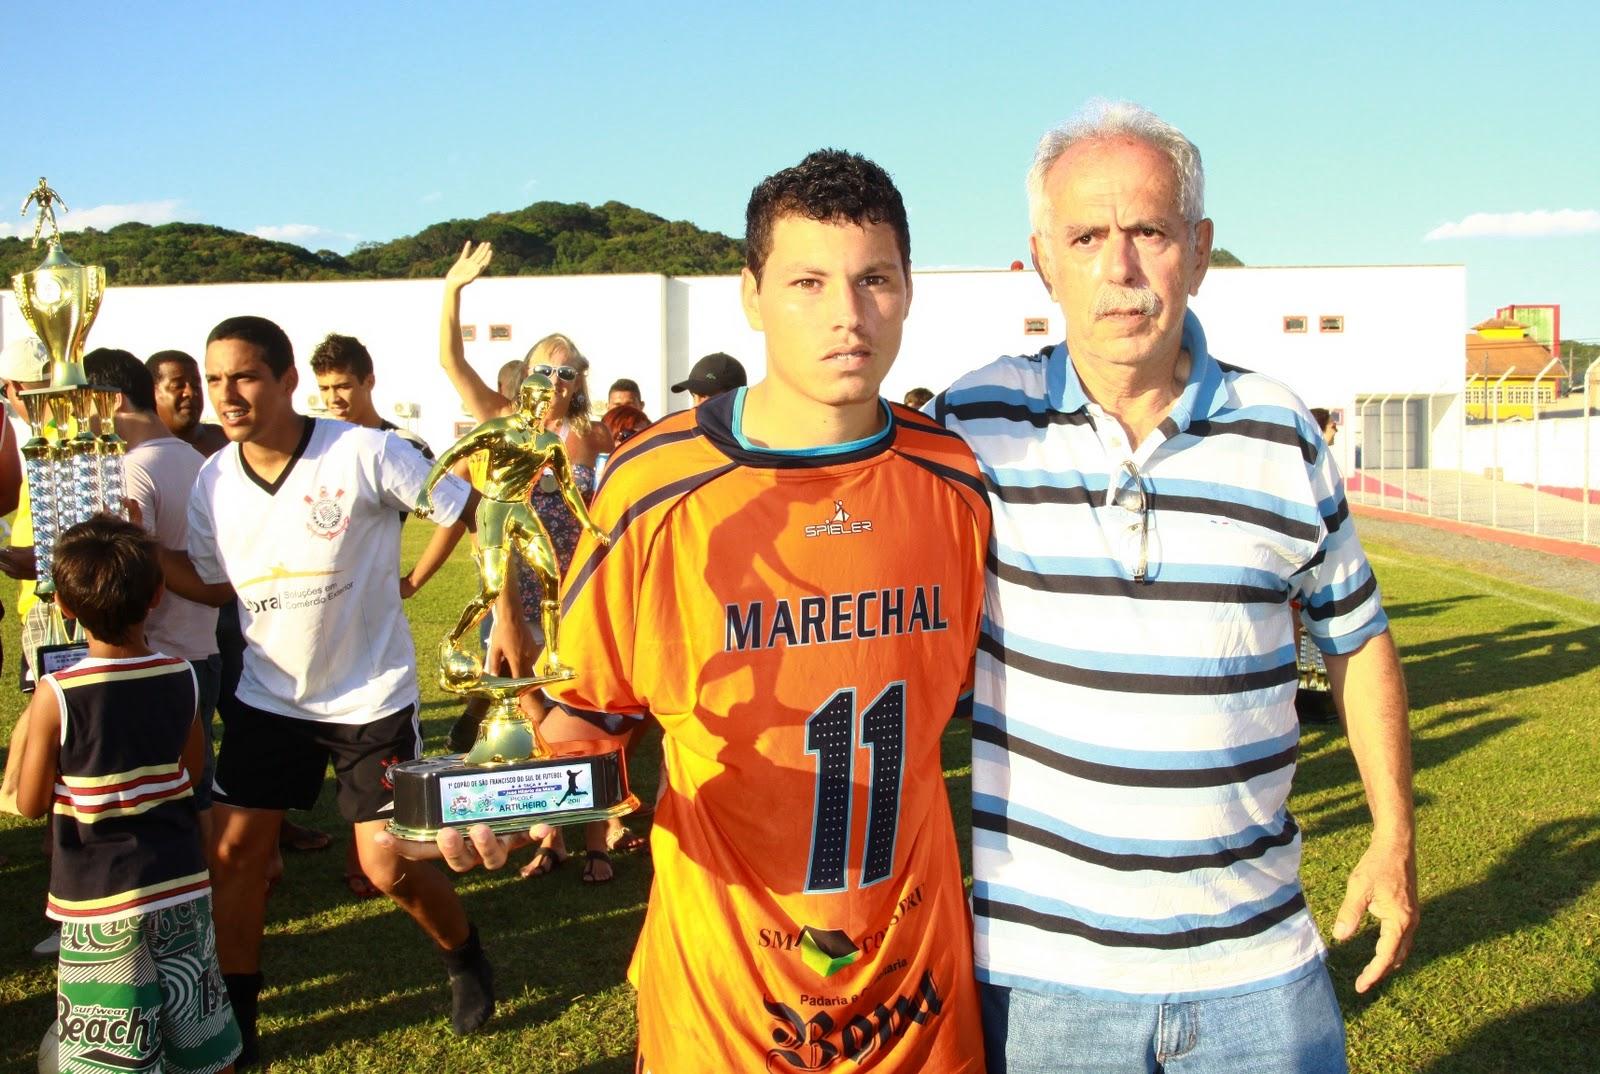 http://1.bp.blogspot.com/-S7HdvdRkIY0/TvB6t93tH2I/AAAAAAAAAWE/_imsGGq9b9c/s1600/Elias+de+Lara+-+Artilheiro+Cop%25C3%25A3o.JPG